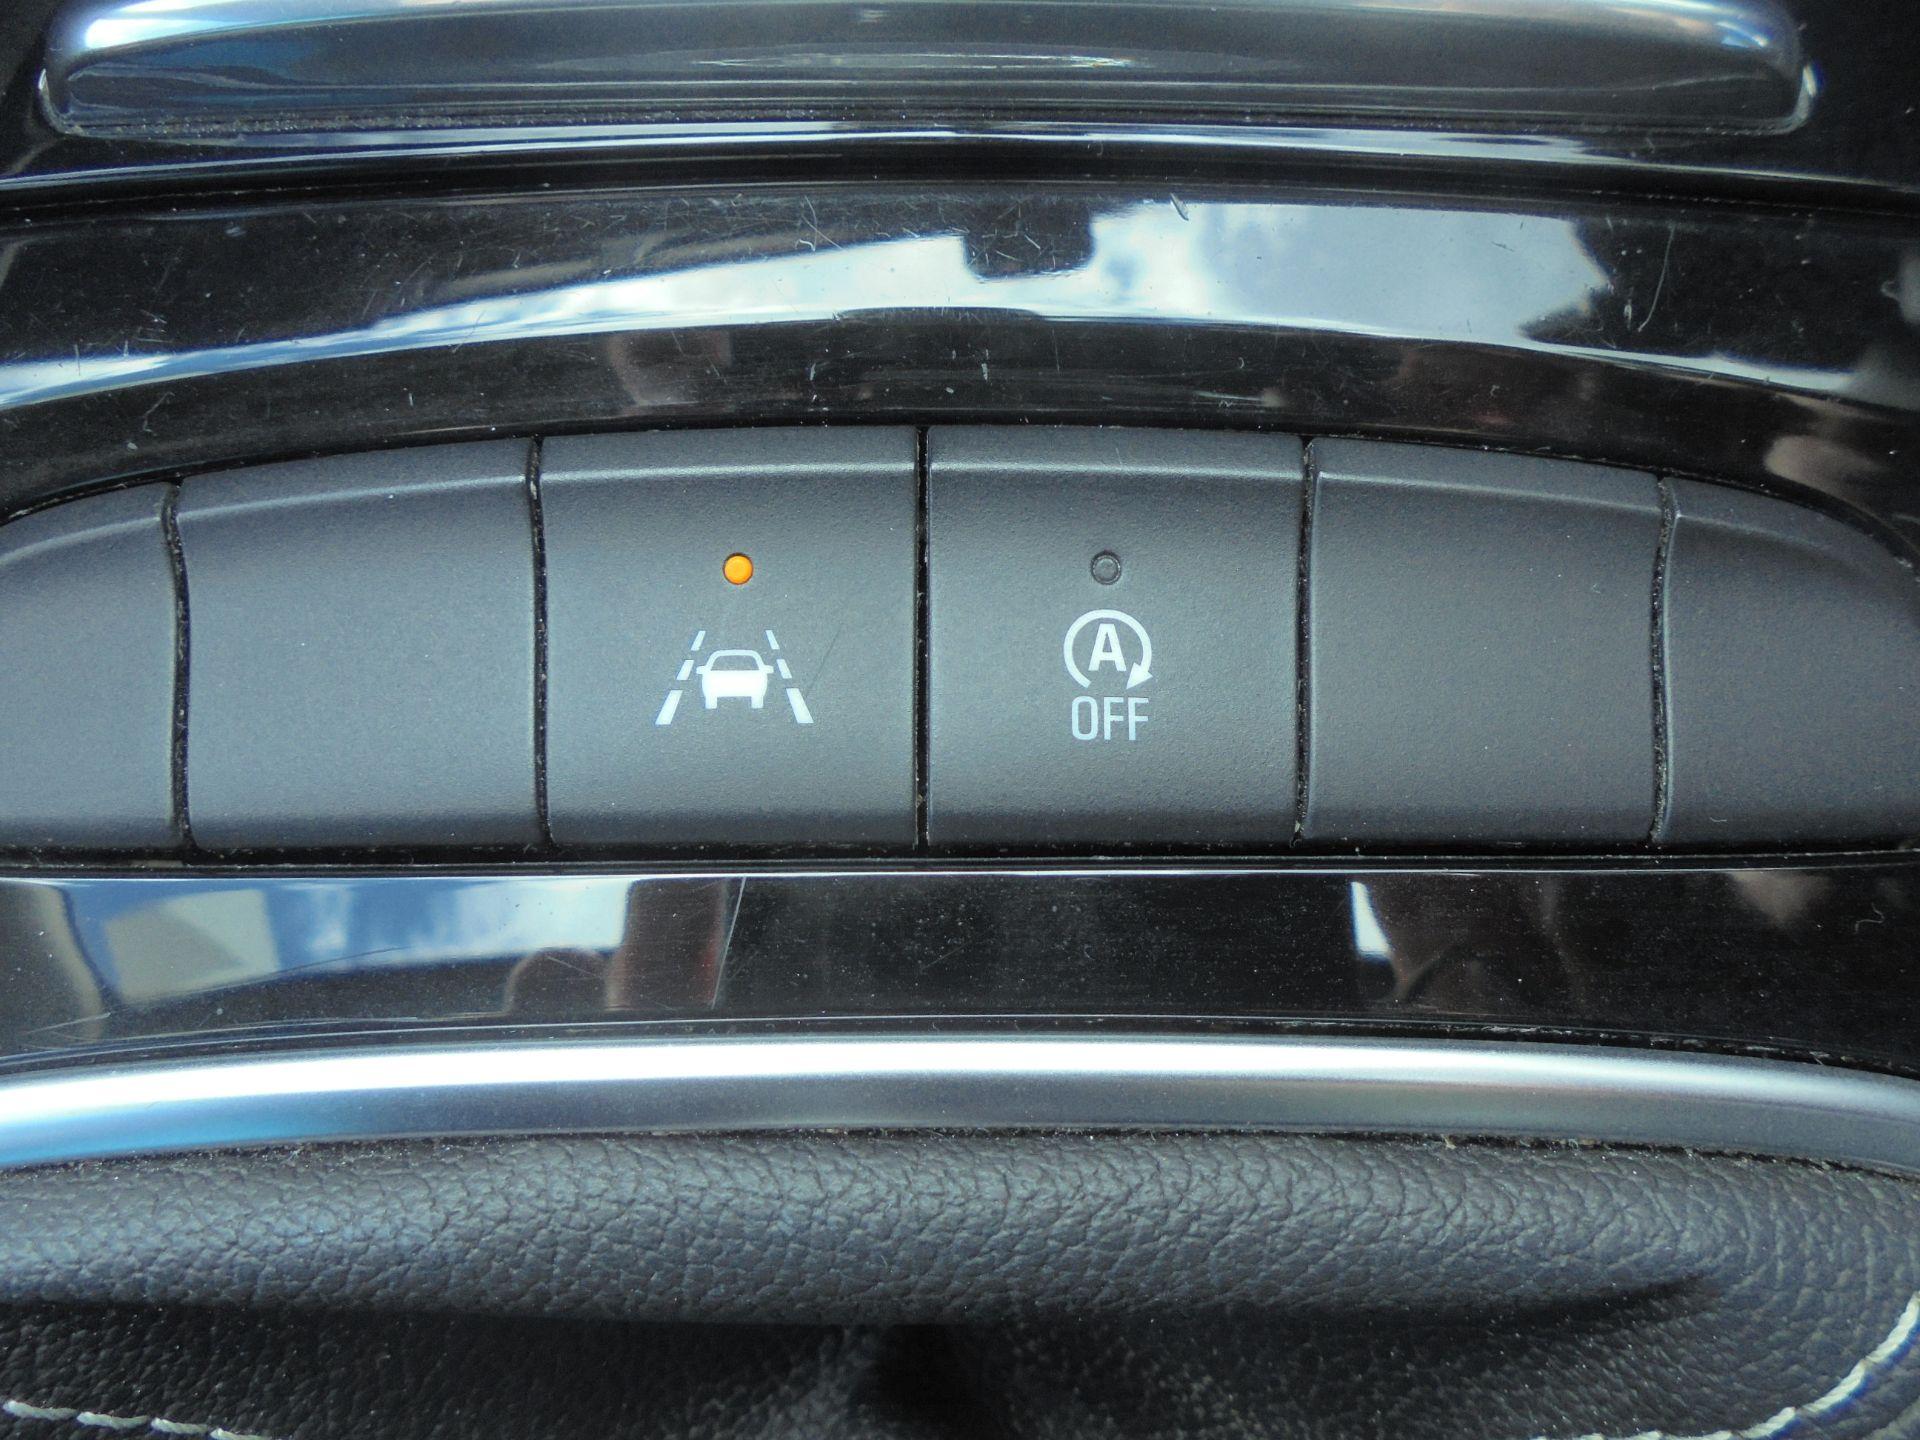 2018 Vauxhall Insignia Grand Sport 1.6 Turbo D Ecotec [136] Sri Nav 5Dr (VU18DFF) Image 18